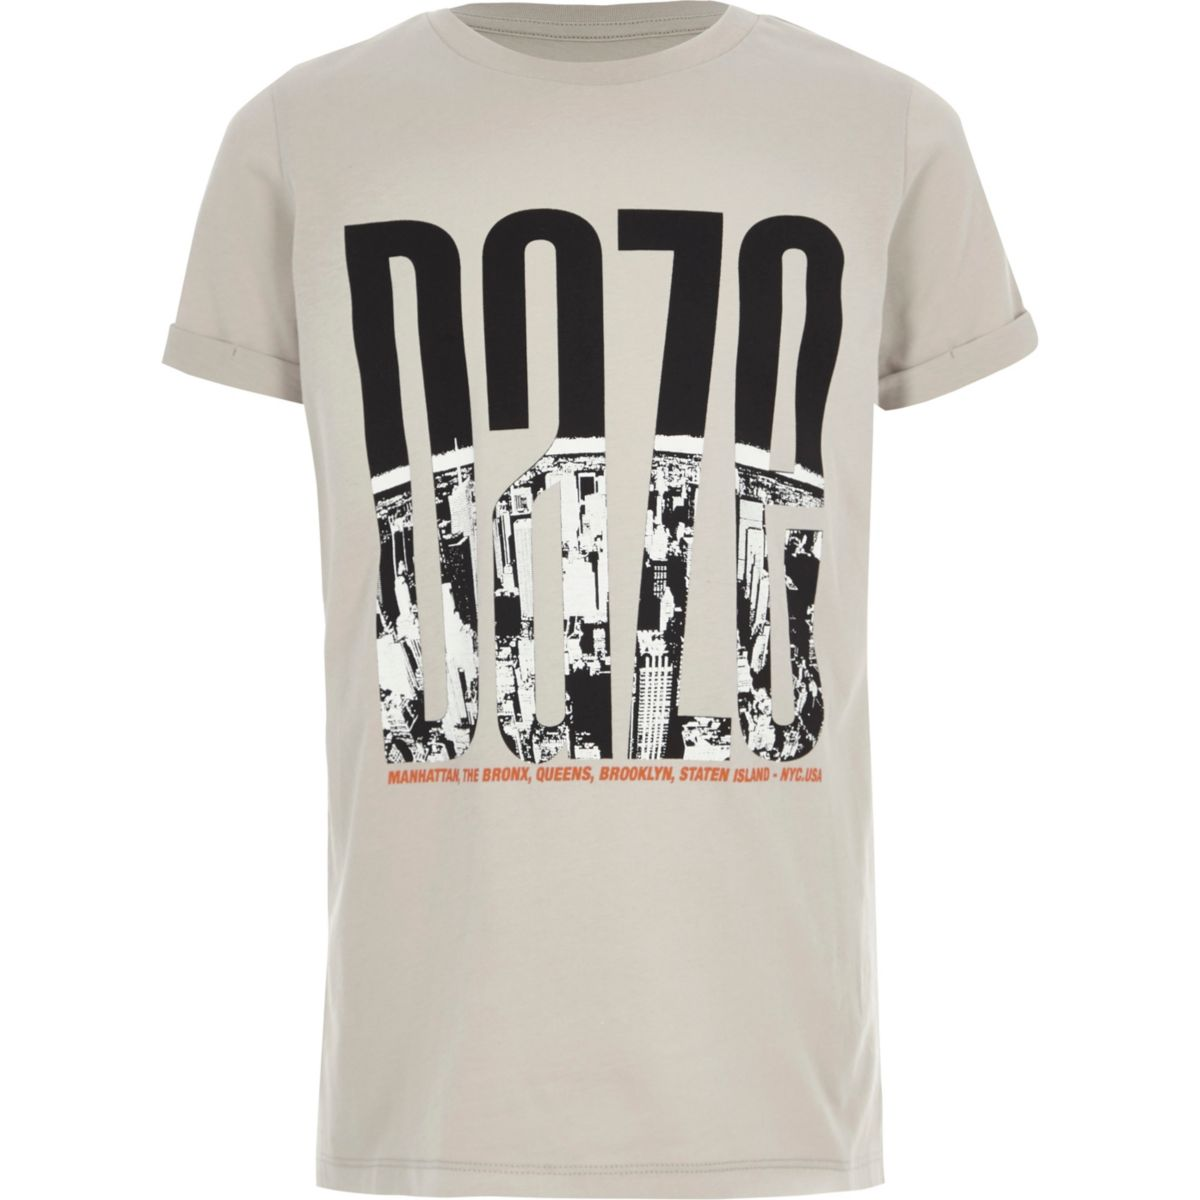 T-shirt à imprimé urbain « Daze » grège garçon